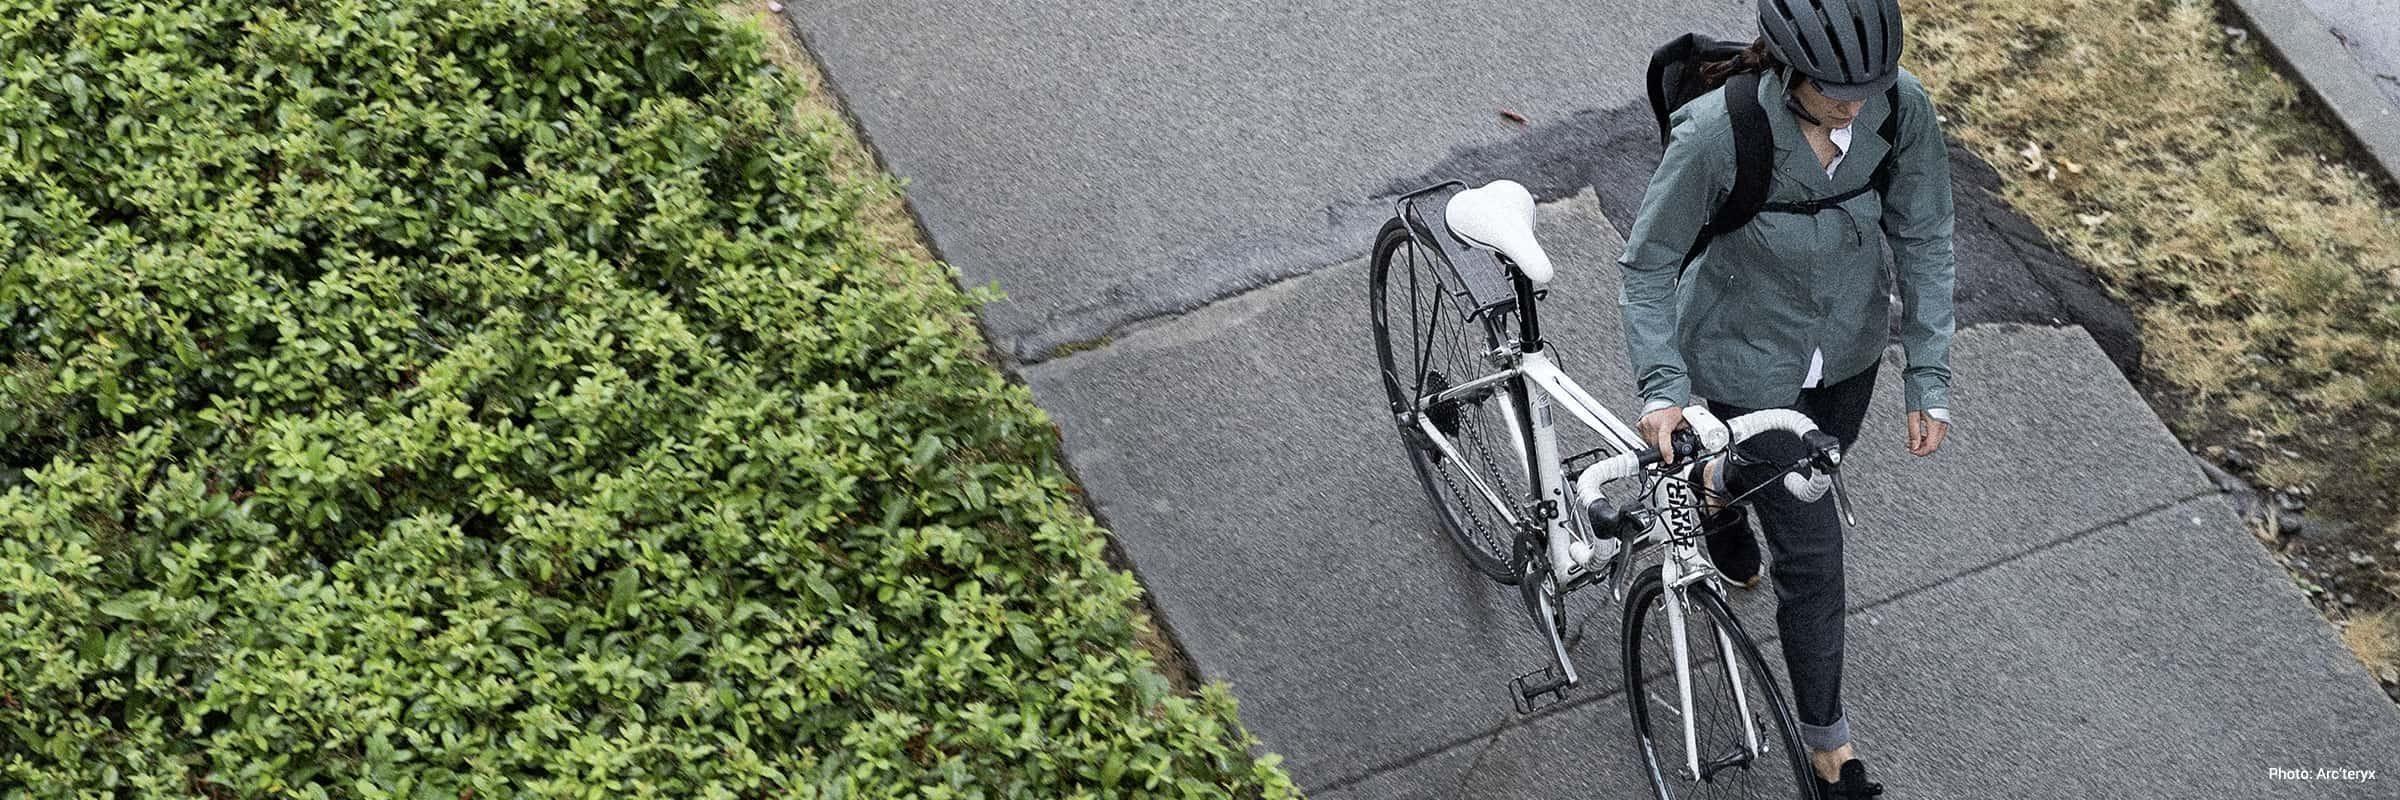 Buff, Castelli, cycling, Garneau, POC. How to Layer for an Enjoyable Fall Bike Ride